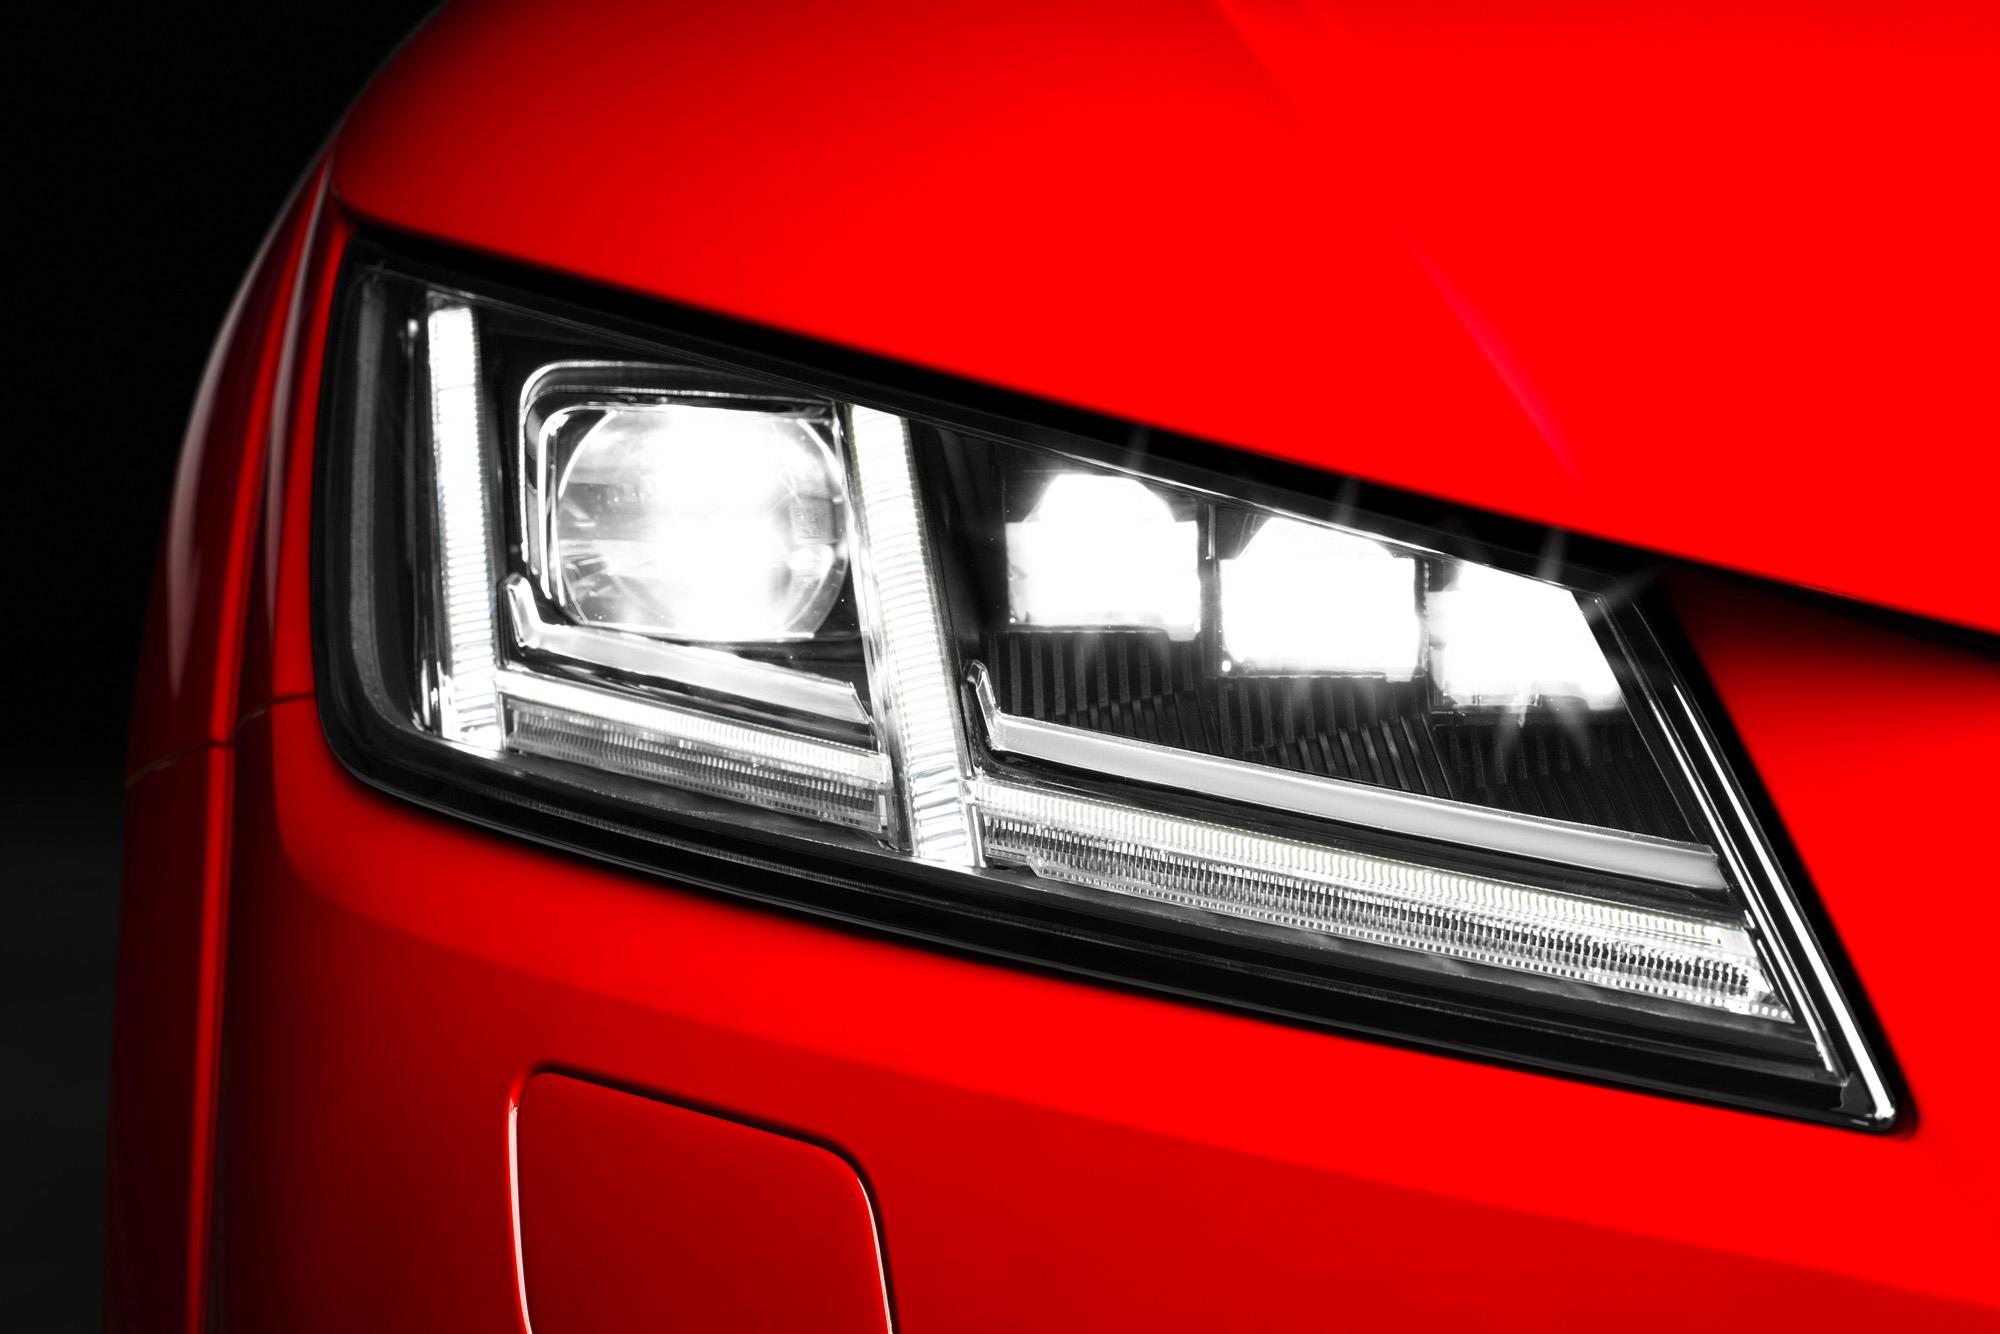 Matrix-LED-Scheinwerfer im Audi TT Coupé